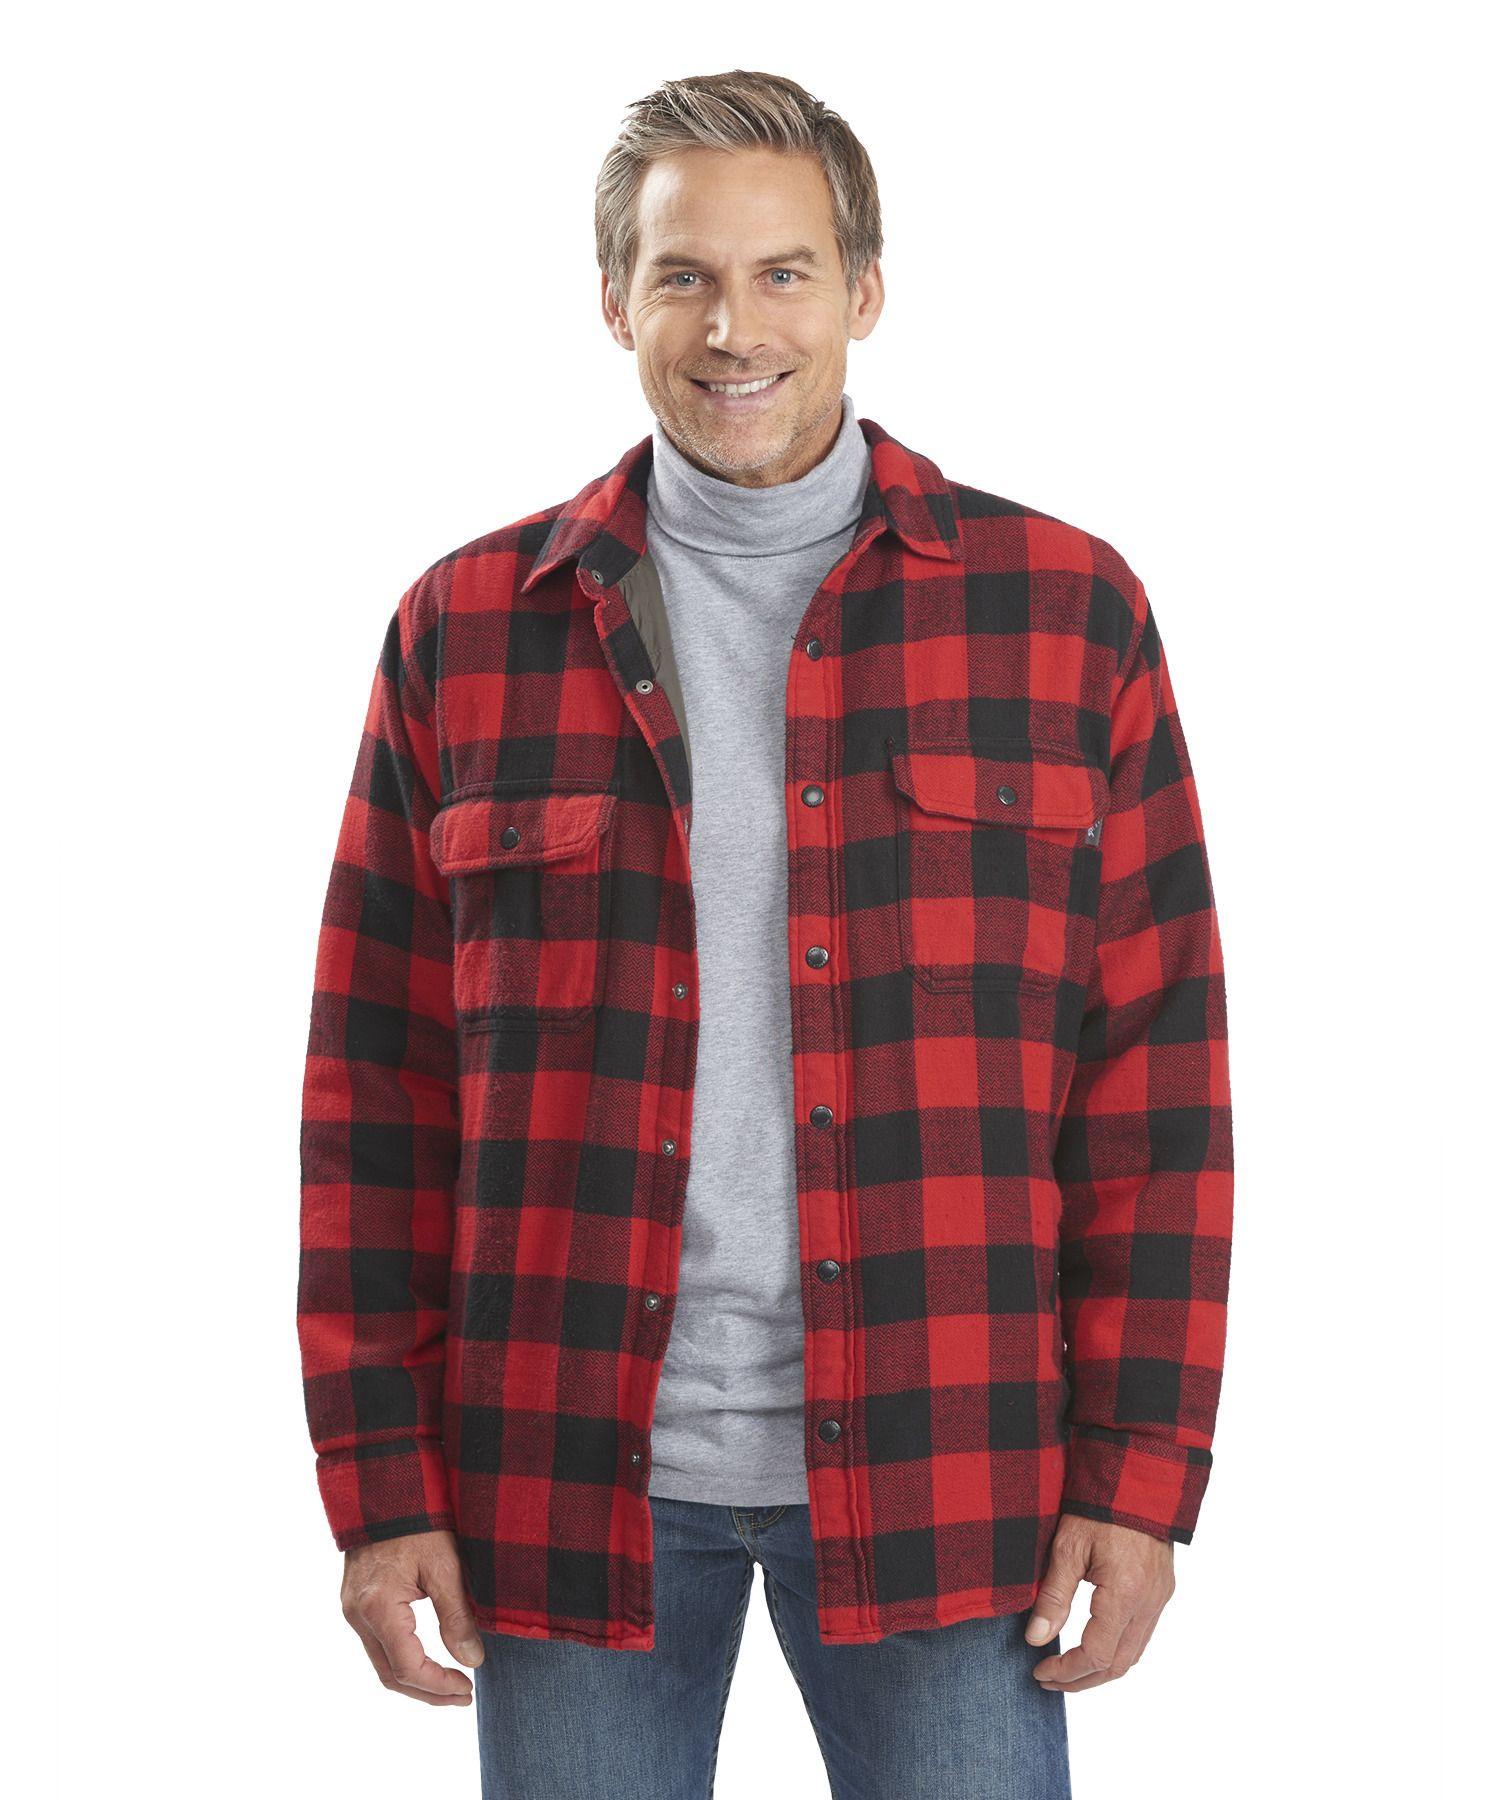 Men 39 s oxbow bend plaid flannel shirt jac w clothing for Plaid shirt jacket mens